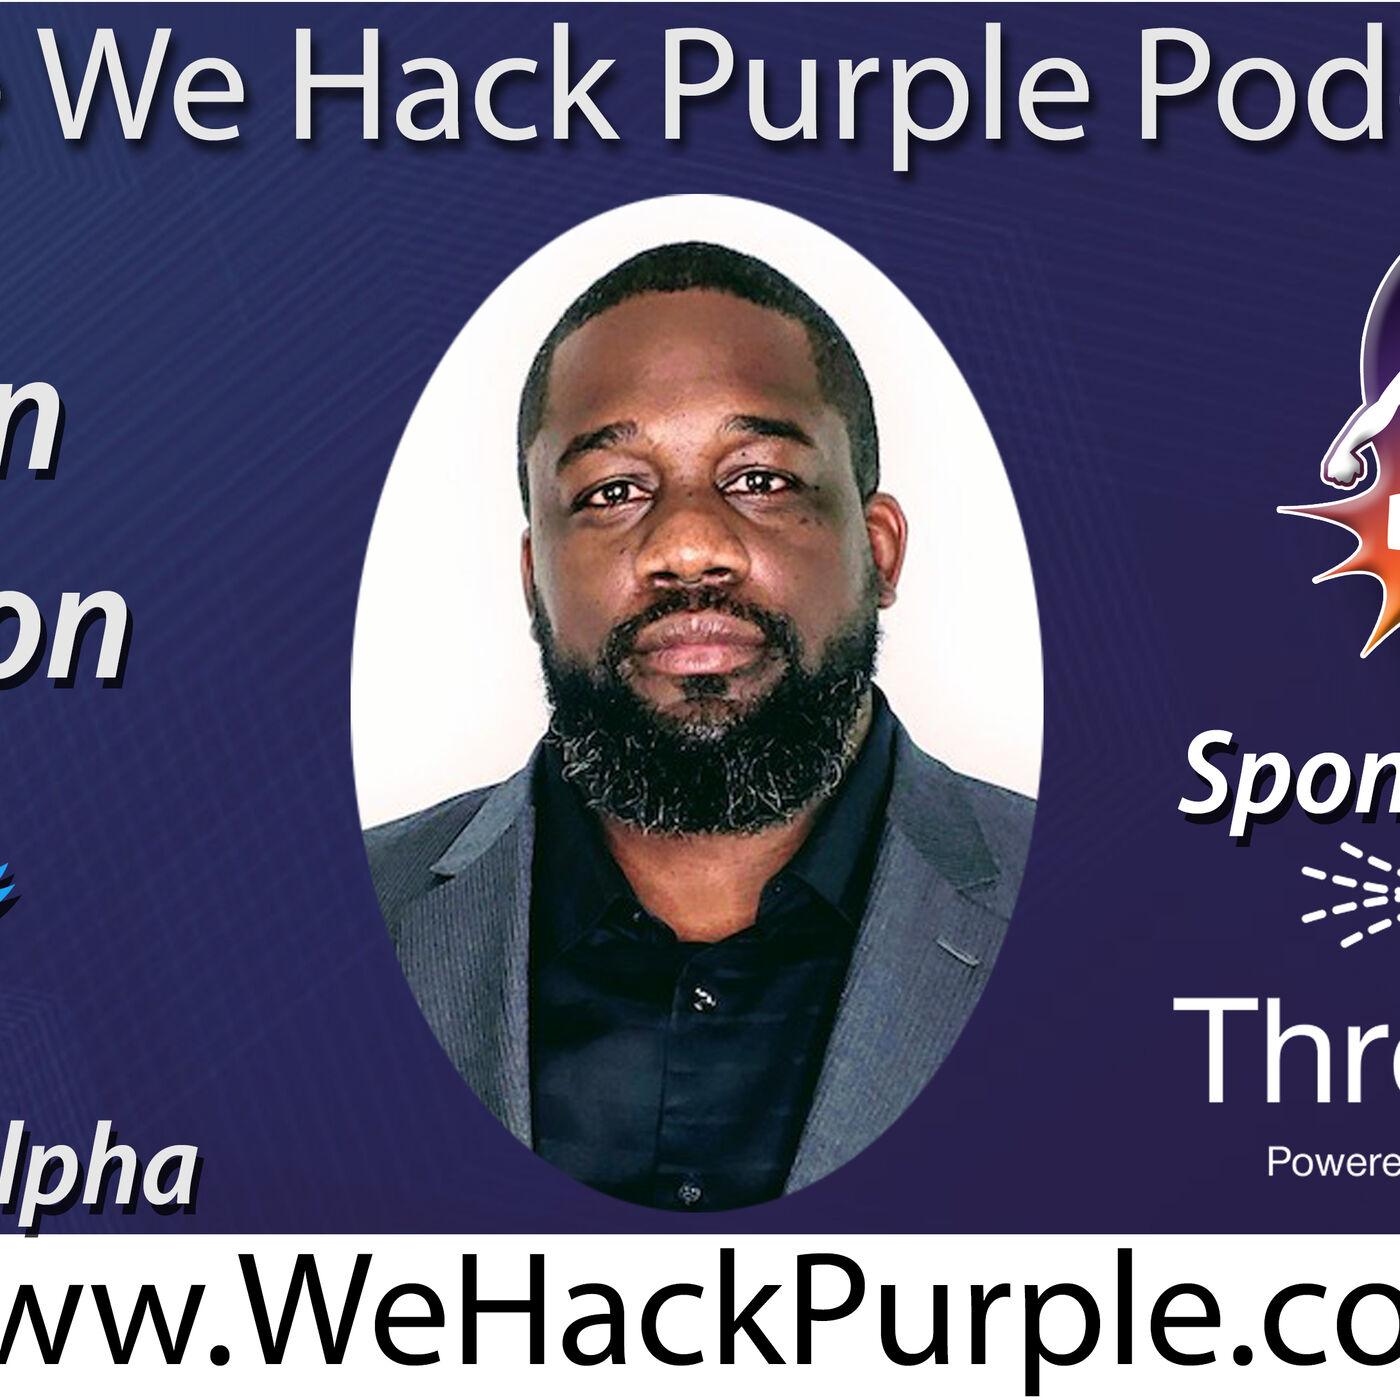 We Hack Purple Podcast 27 with Davin Jackson